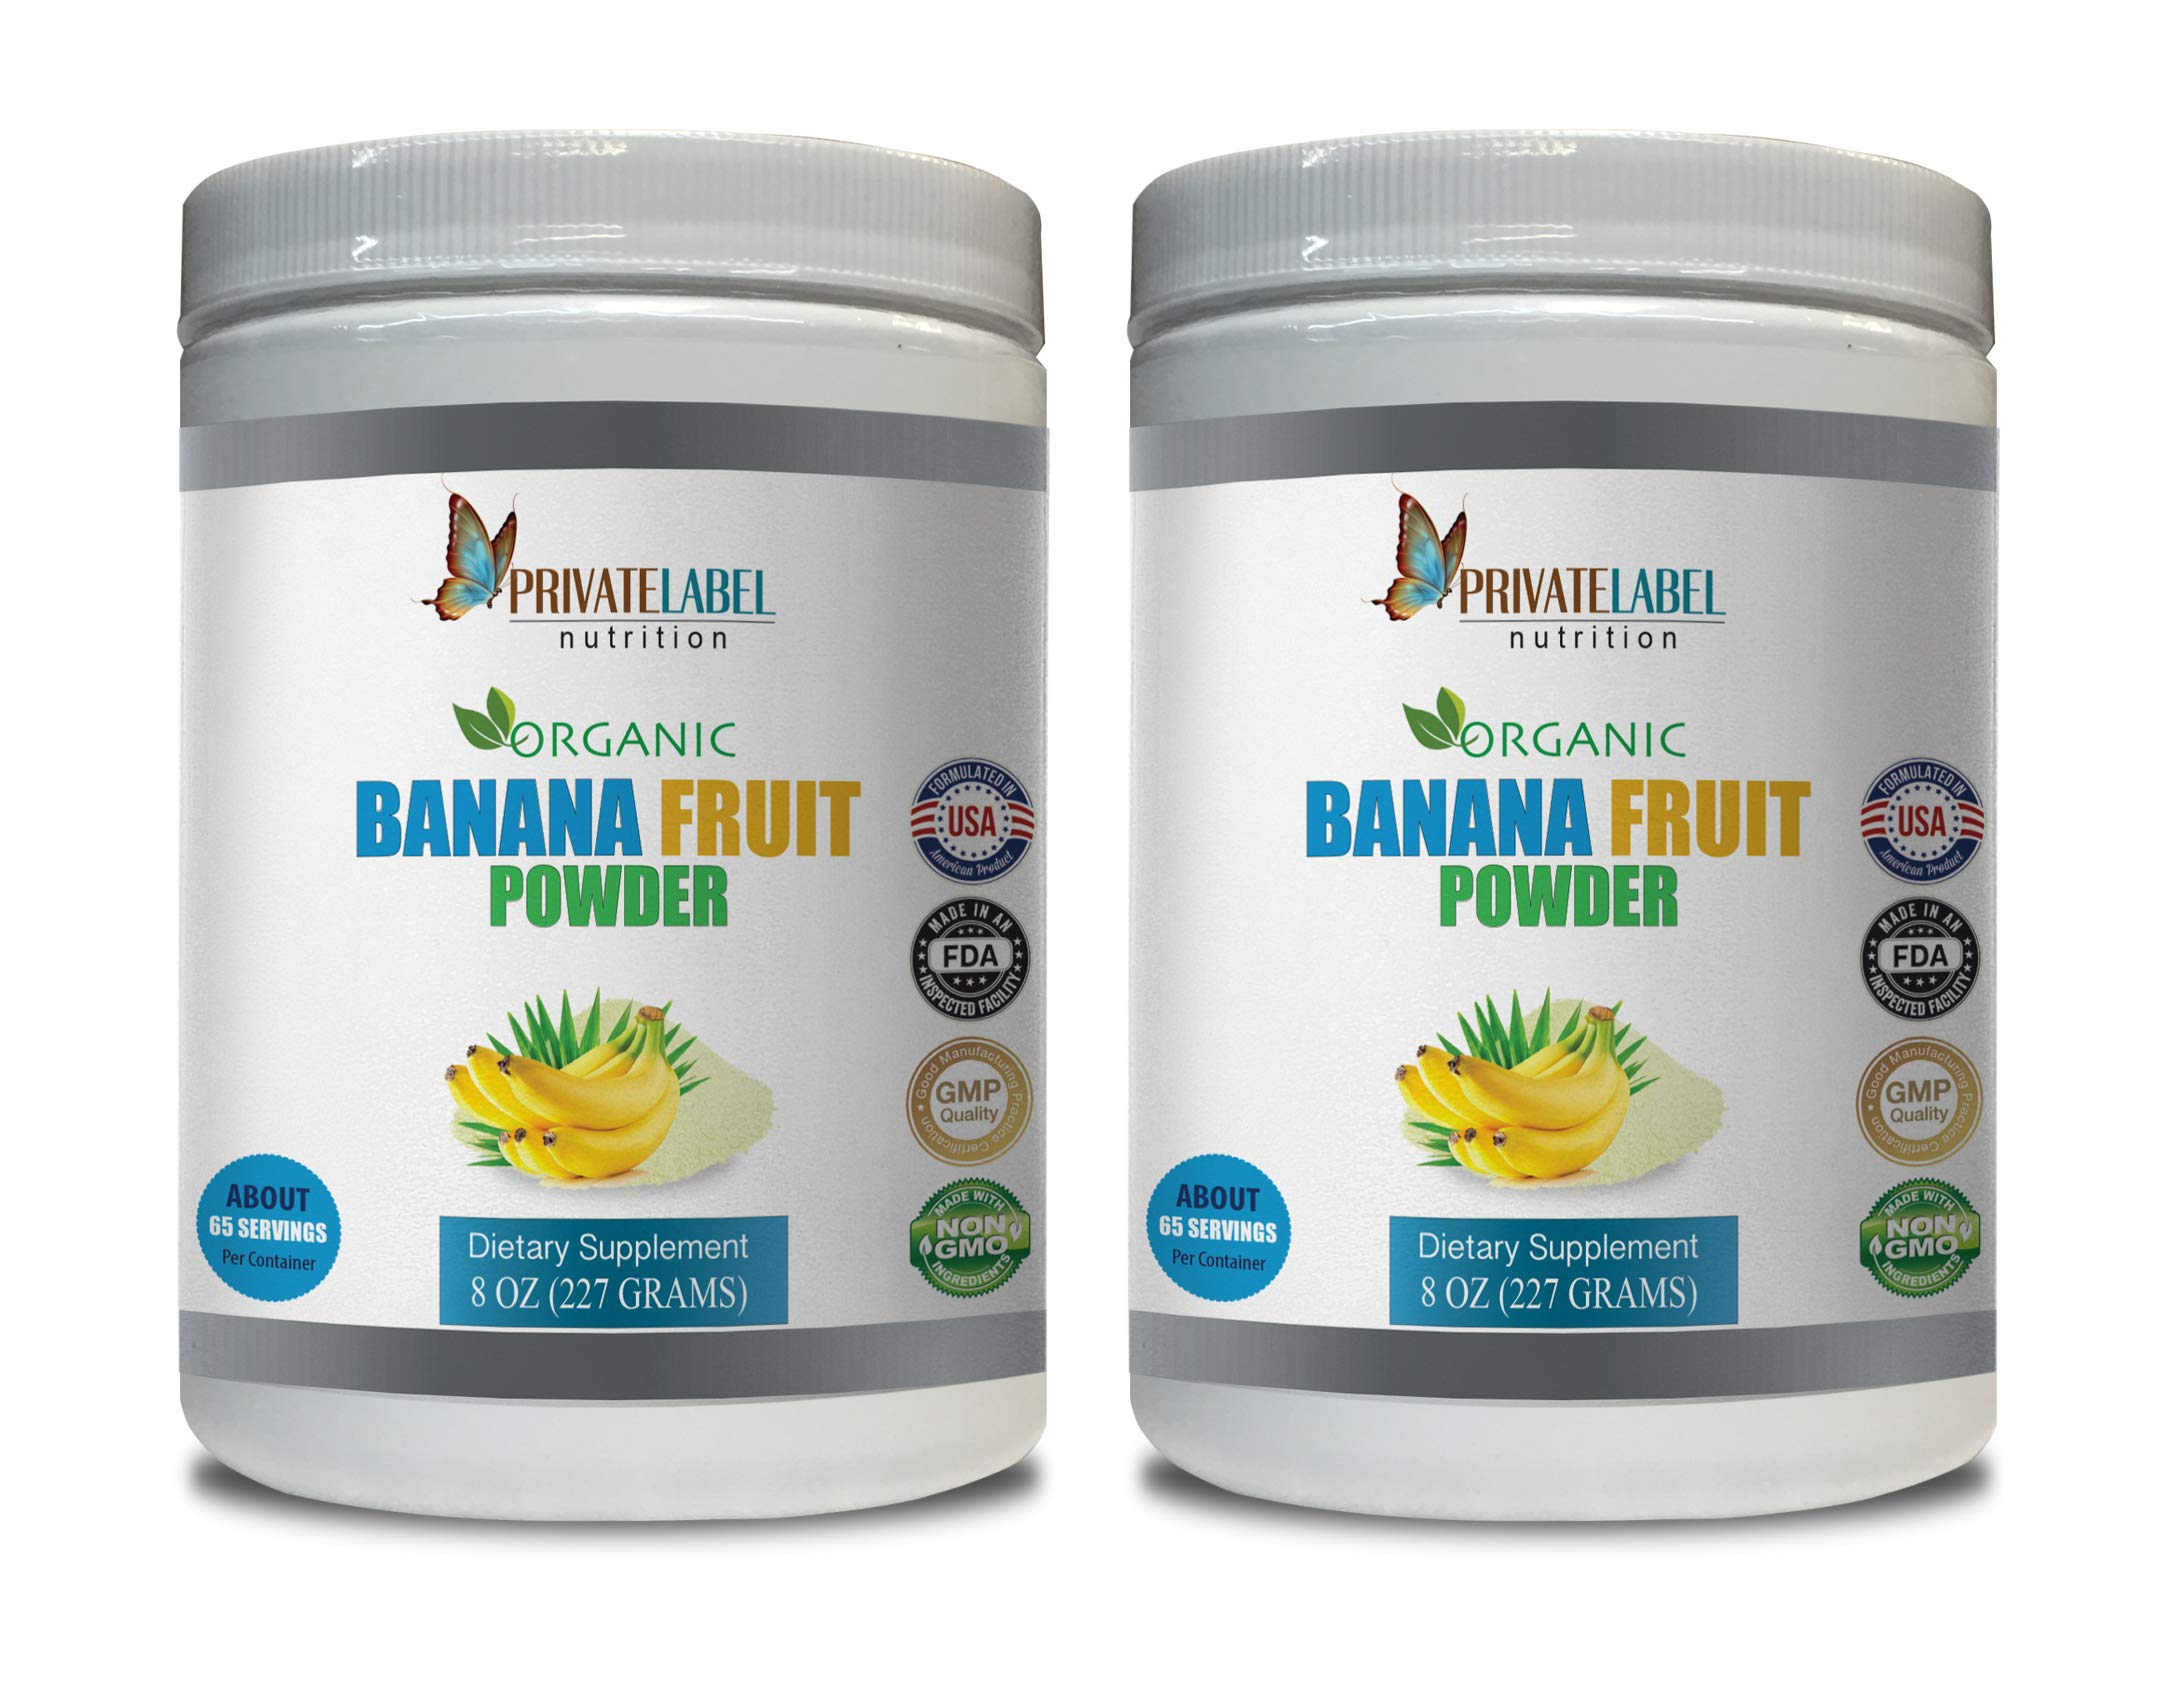 Blood Pressure Vitamins Organics - Banana Fruit Organic Powder - Banana Supplements - 2 Cans 16 OZ (130 Servings)